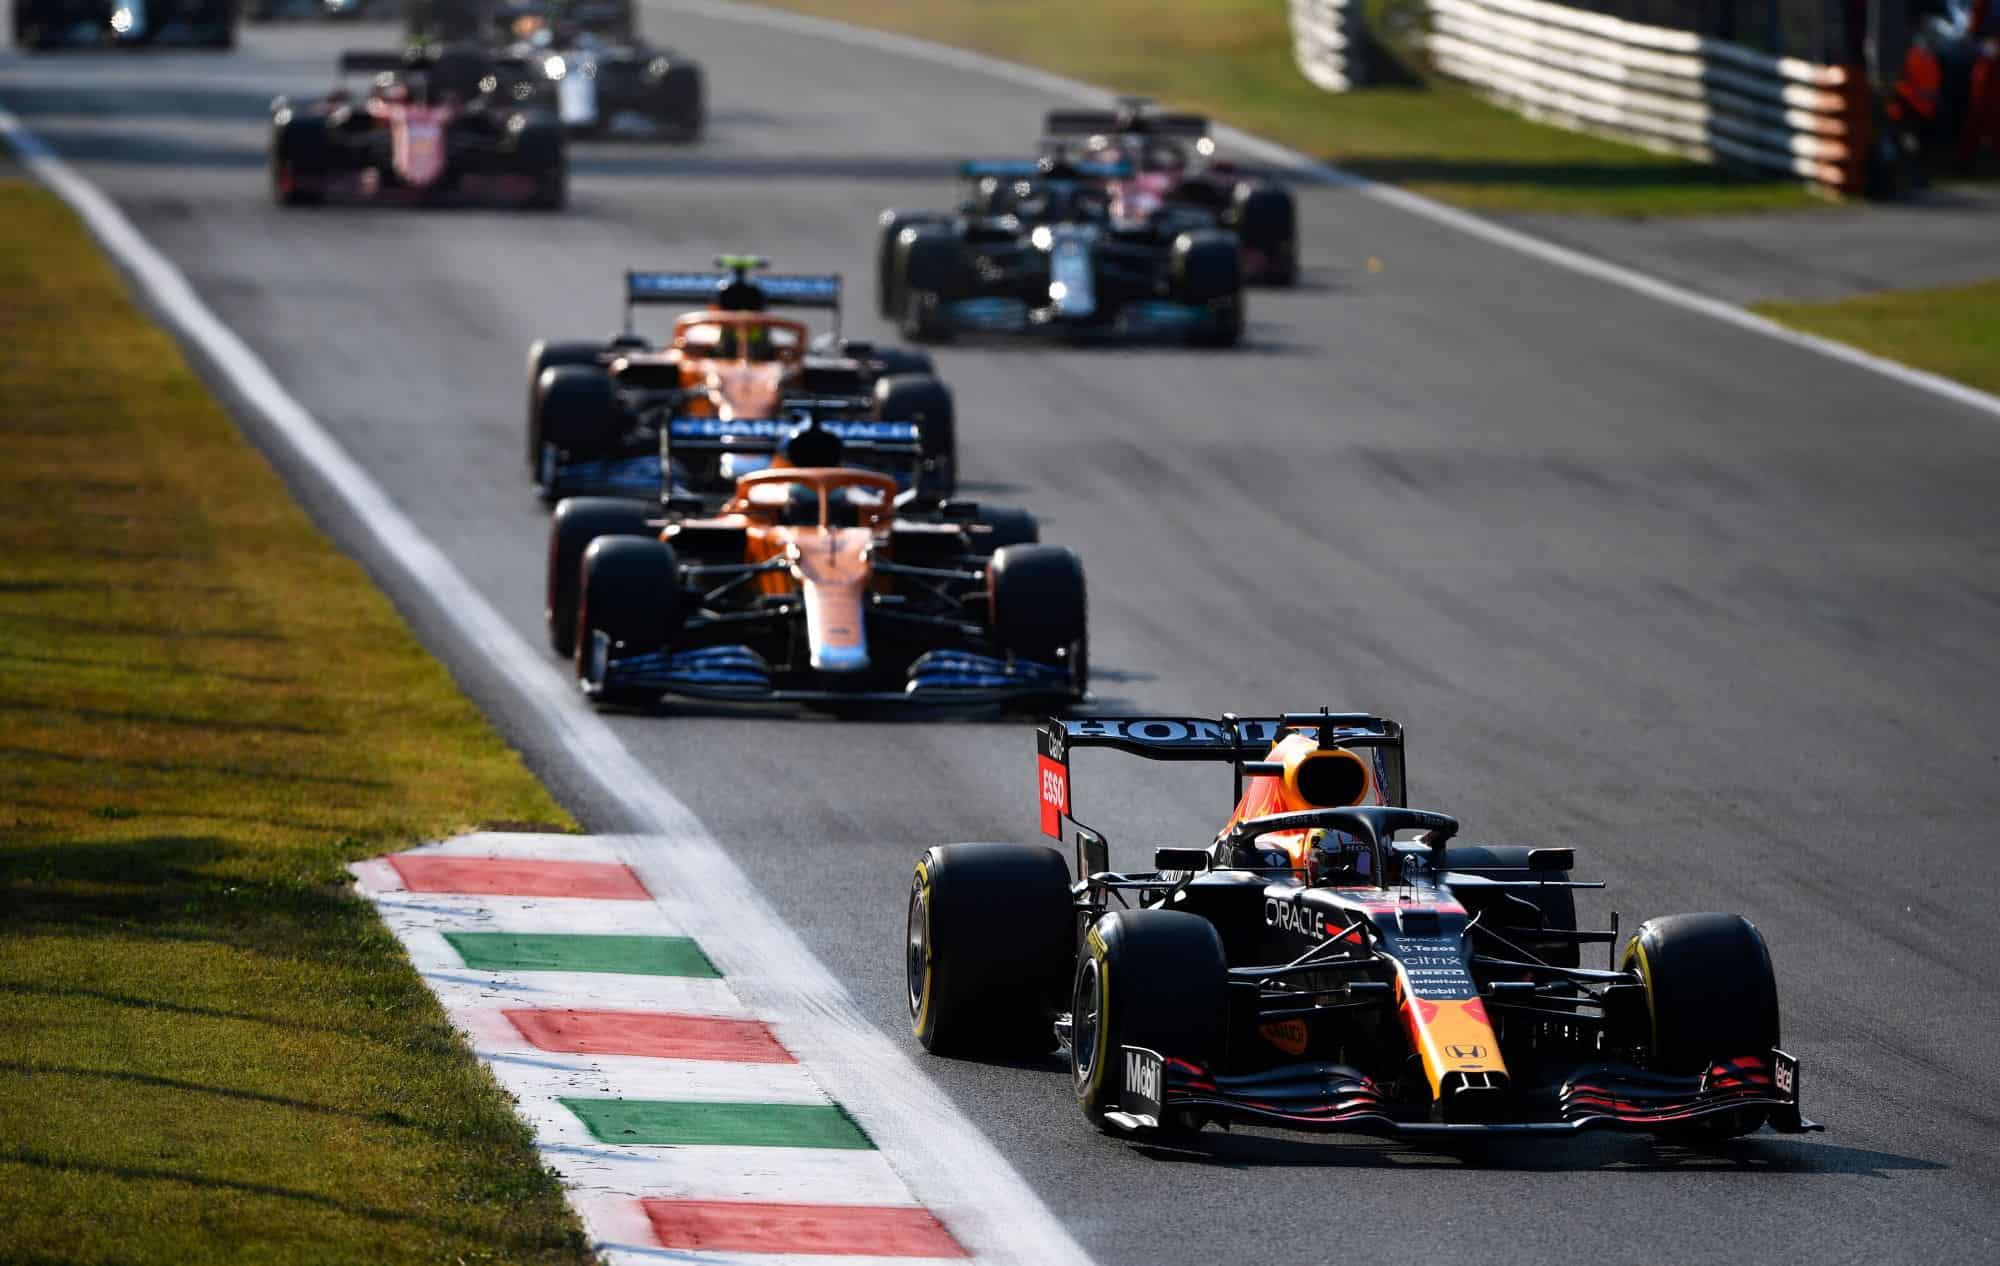 2021 Italian GP Verstappen leads Ricciardo Norris Photo Red Bull